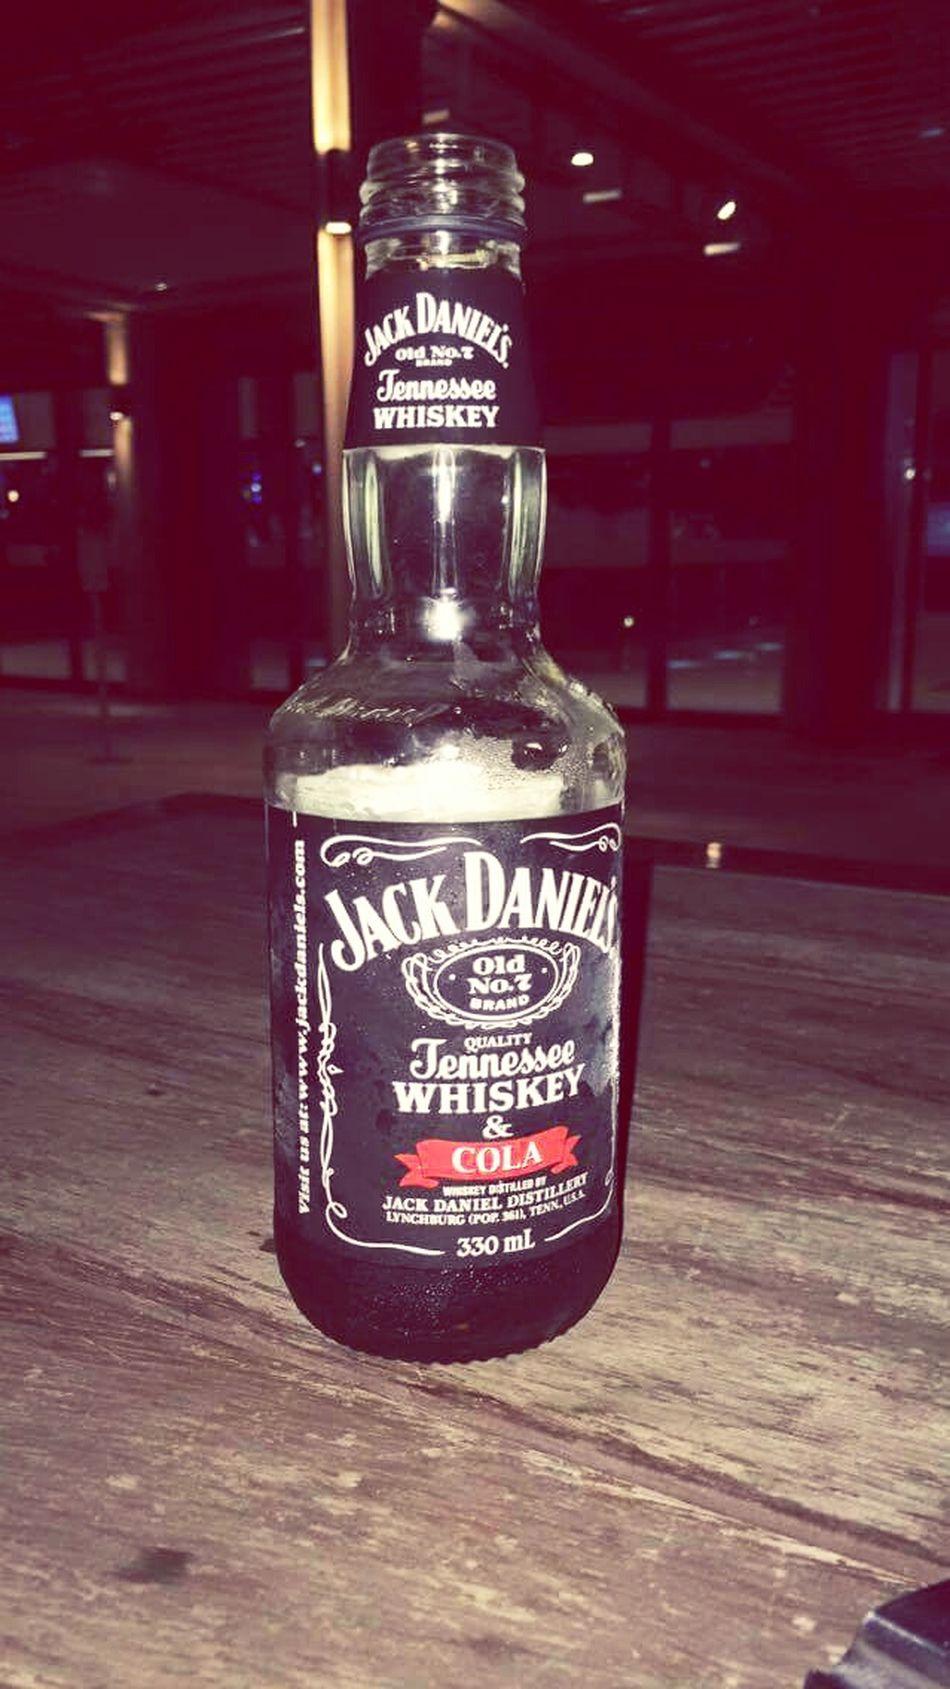 My friend Jack Jackdaniels Jack JD Jd&coke Alcohol Whiskey Drinking Relaxing Enjoying Life Taking Photos